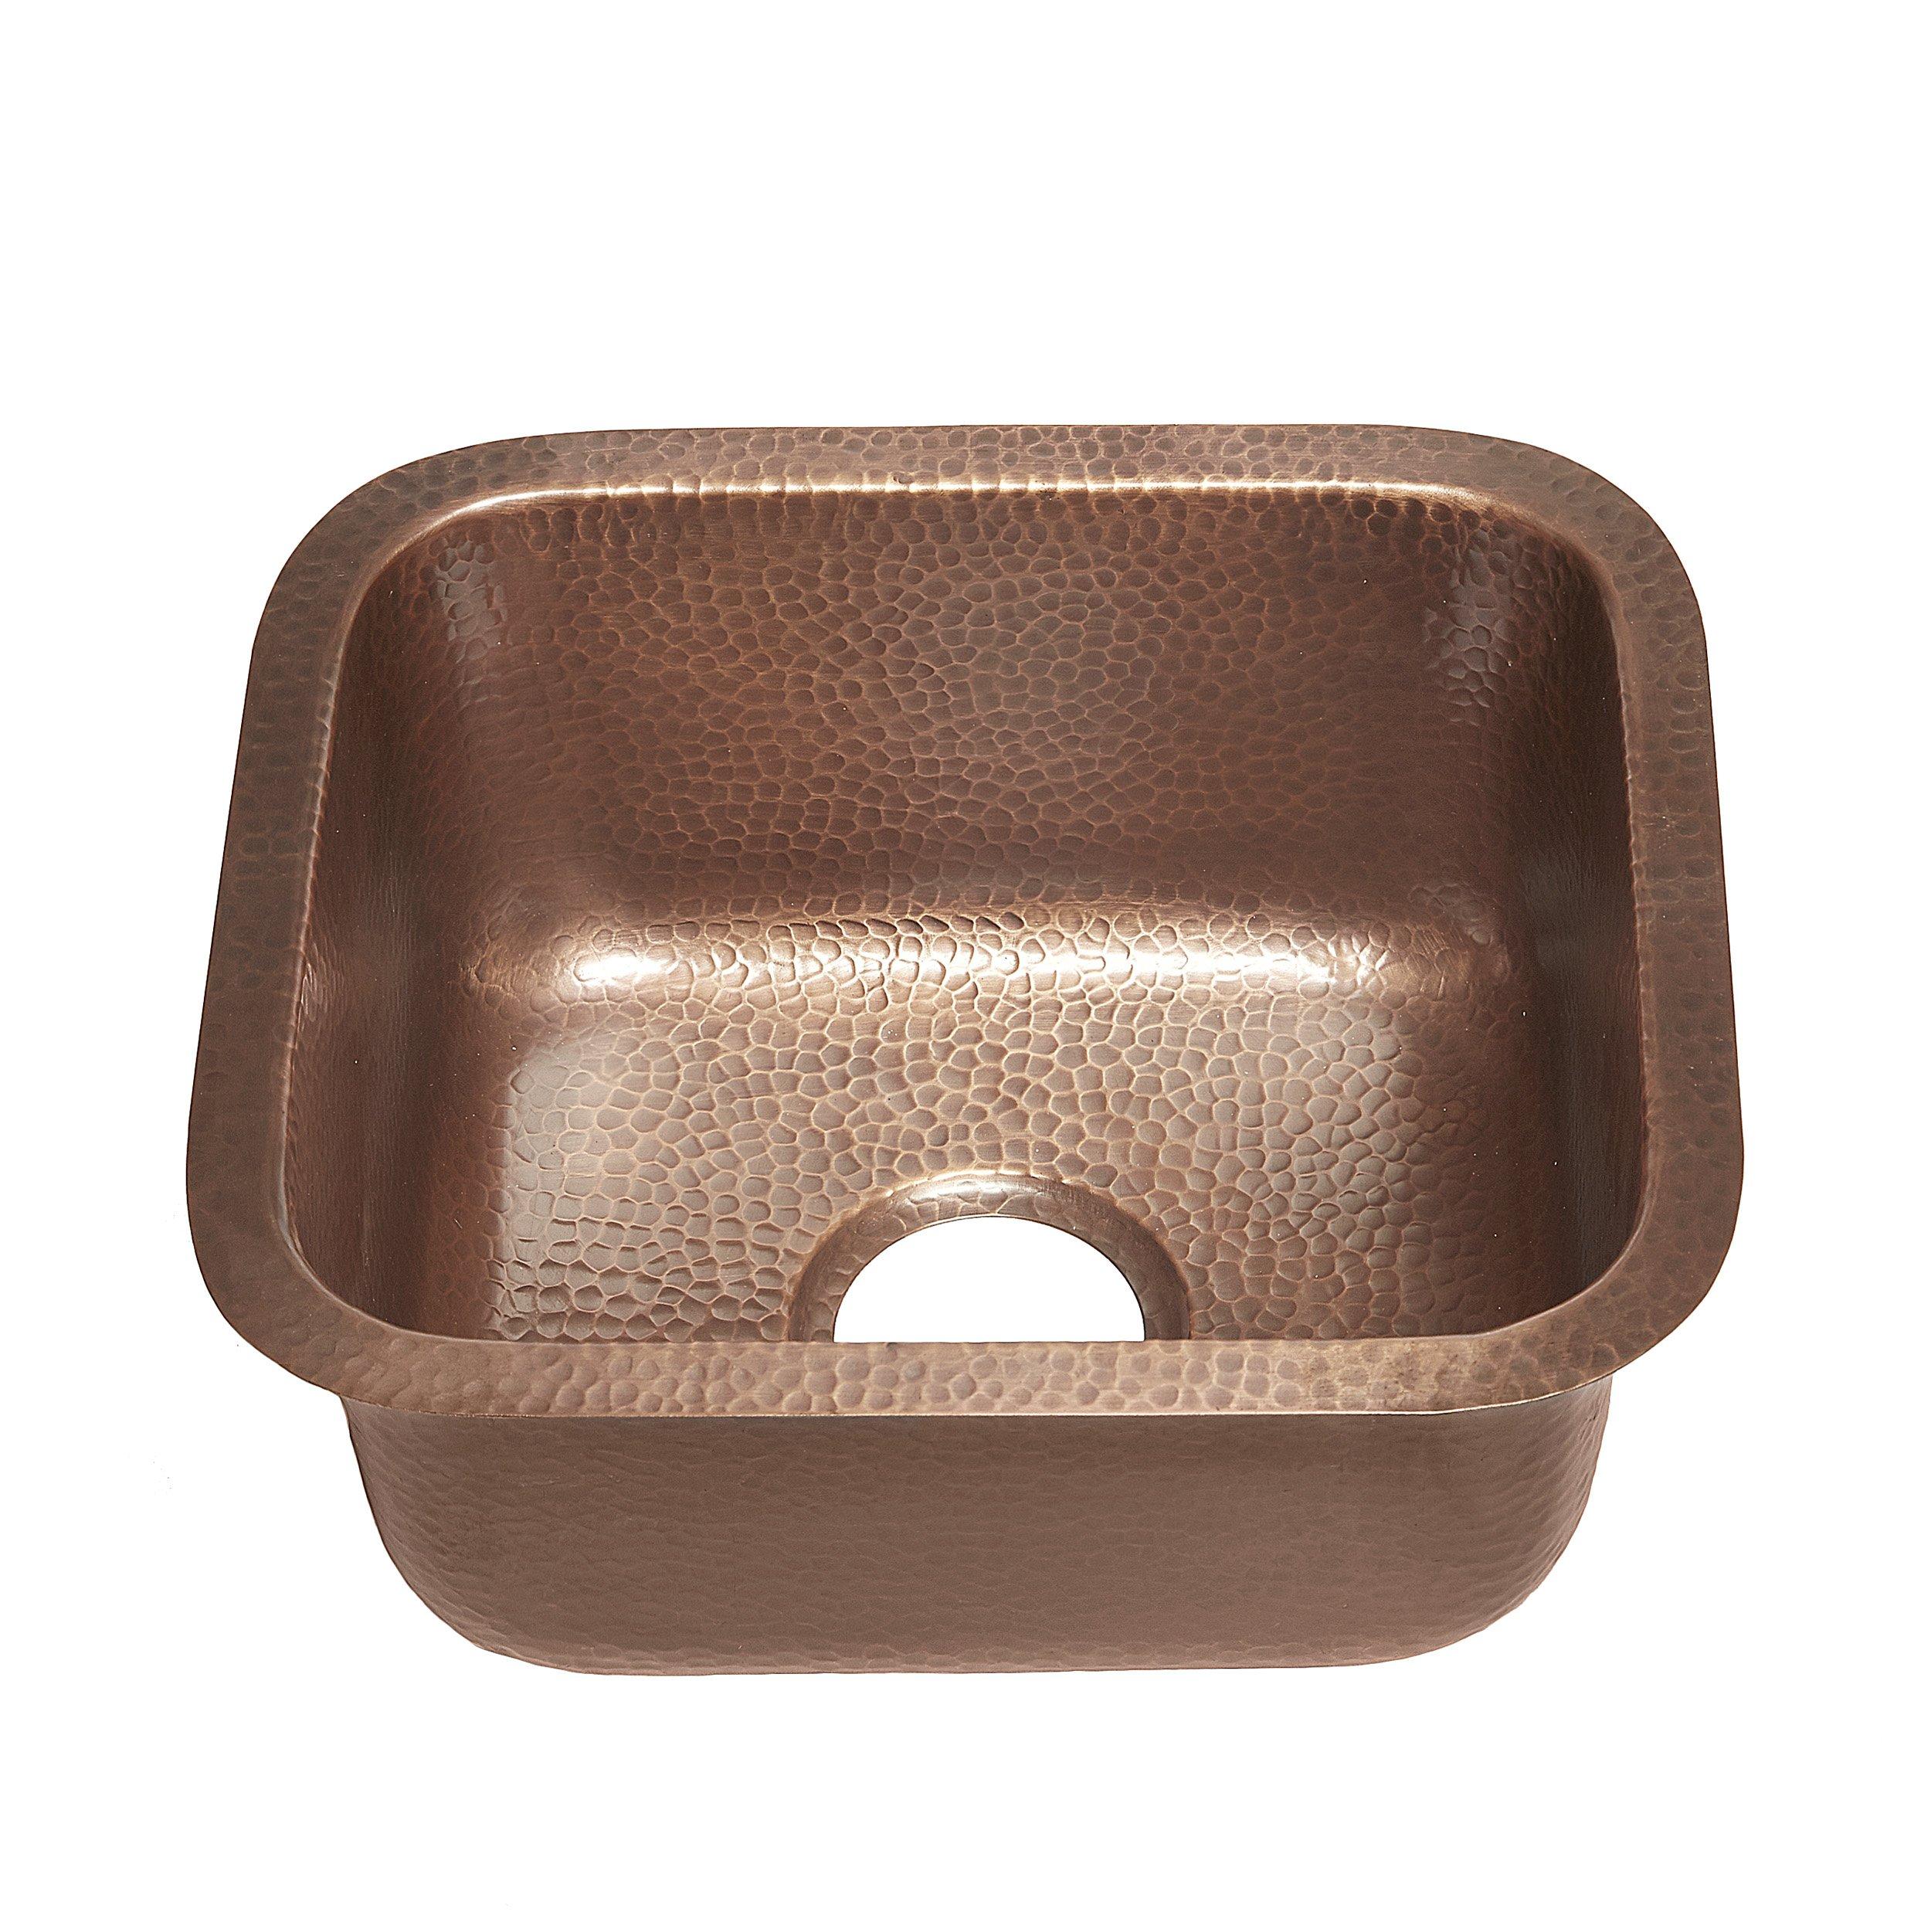 Sinkology Sisley 17-inch Bar Prep Copper Sink in Hammered Antique copper